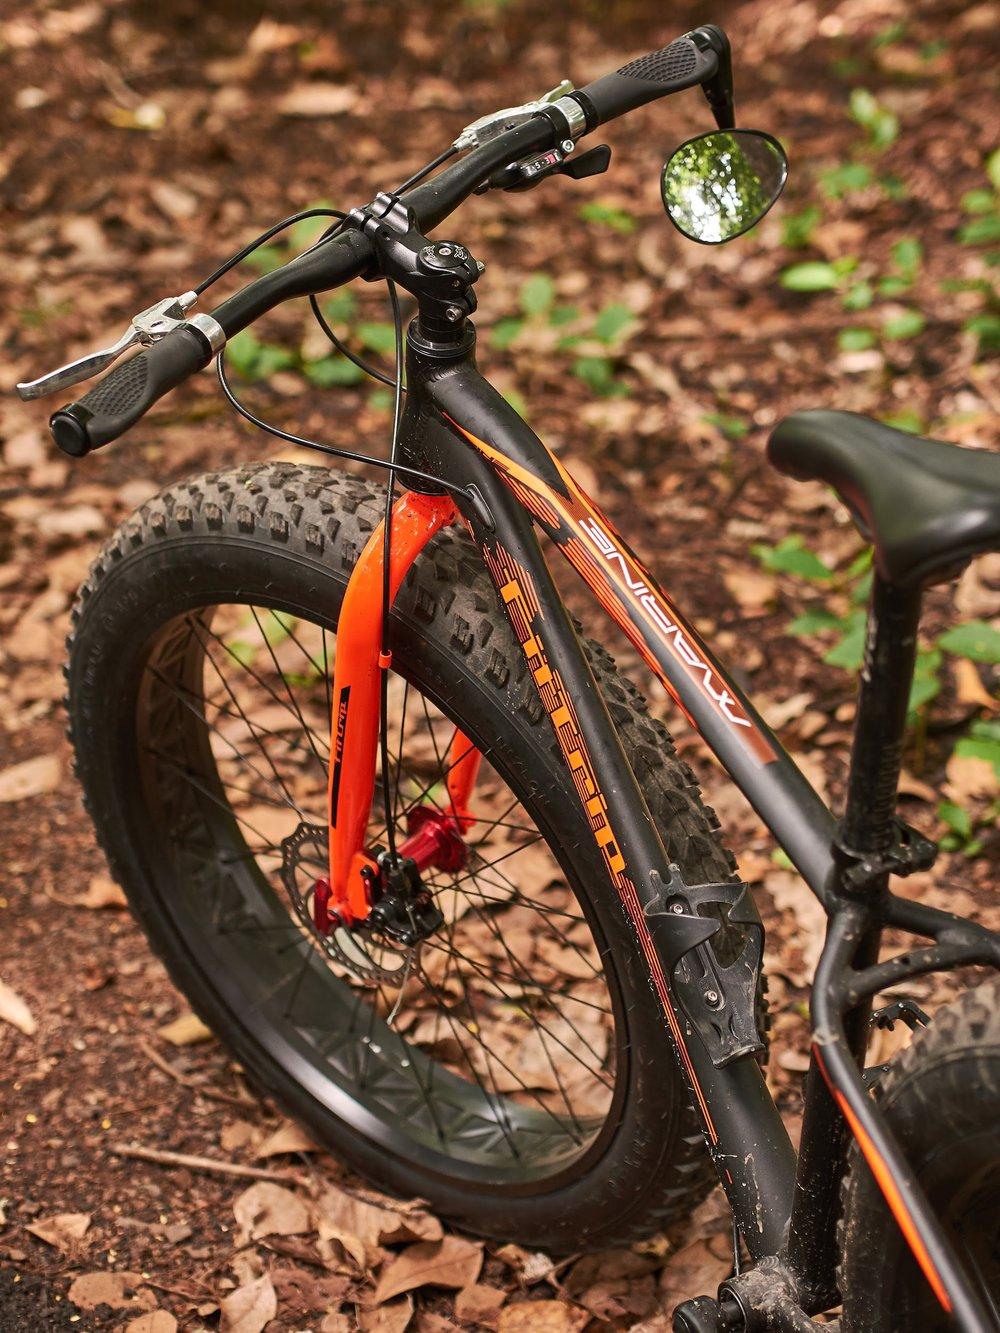 Fittrip Marine Fatbike Review India Konkan Bicycle Touring 1.jpg